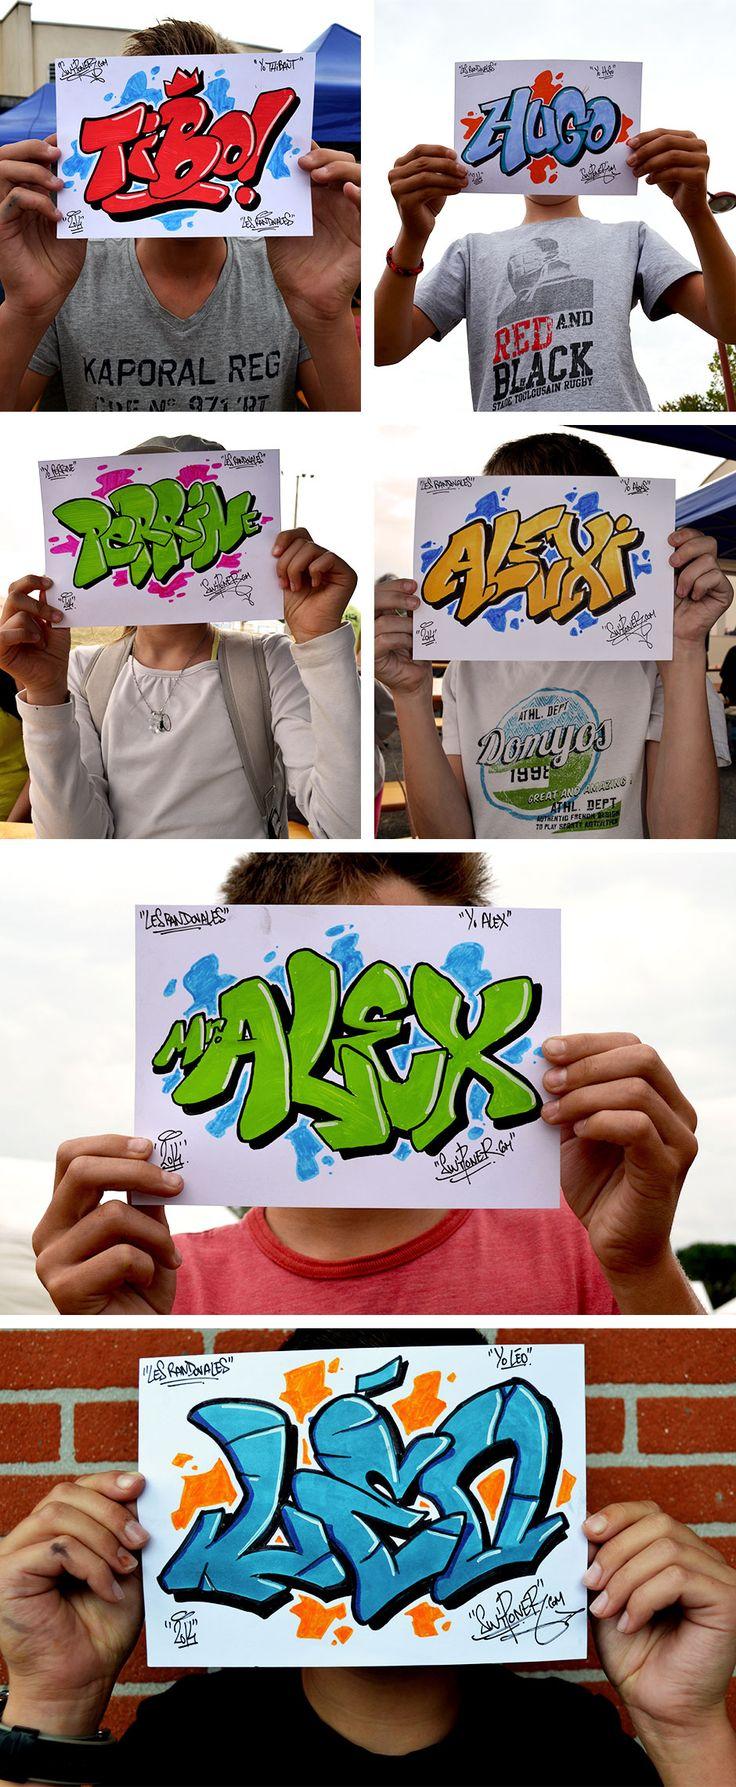 Animation-graffiti-toulouse-prenoms- montage-1-deco-graffiti-toulouse-swip-swiponer-wxp-animation-prenom